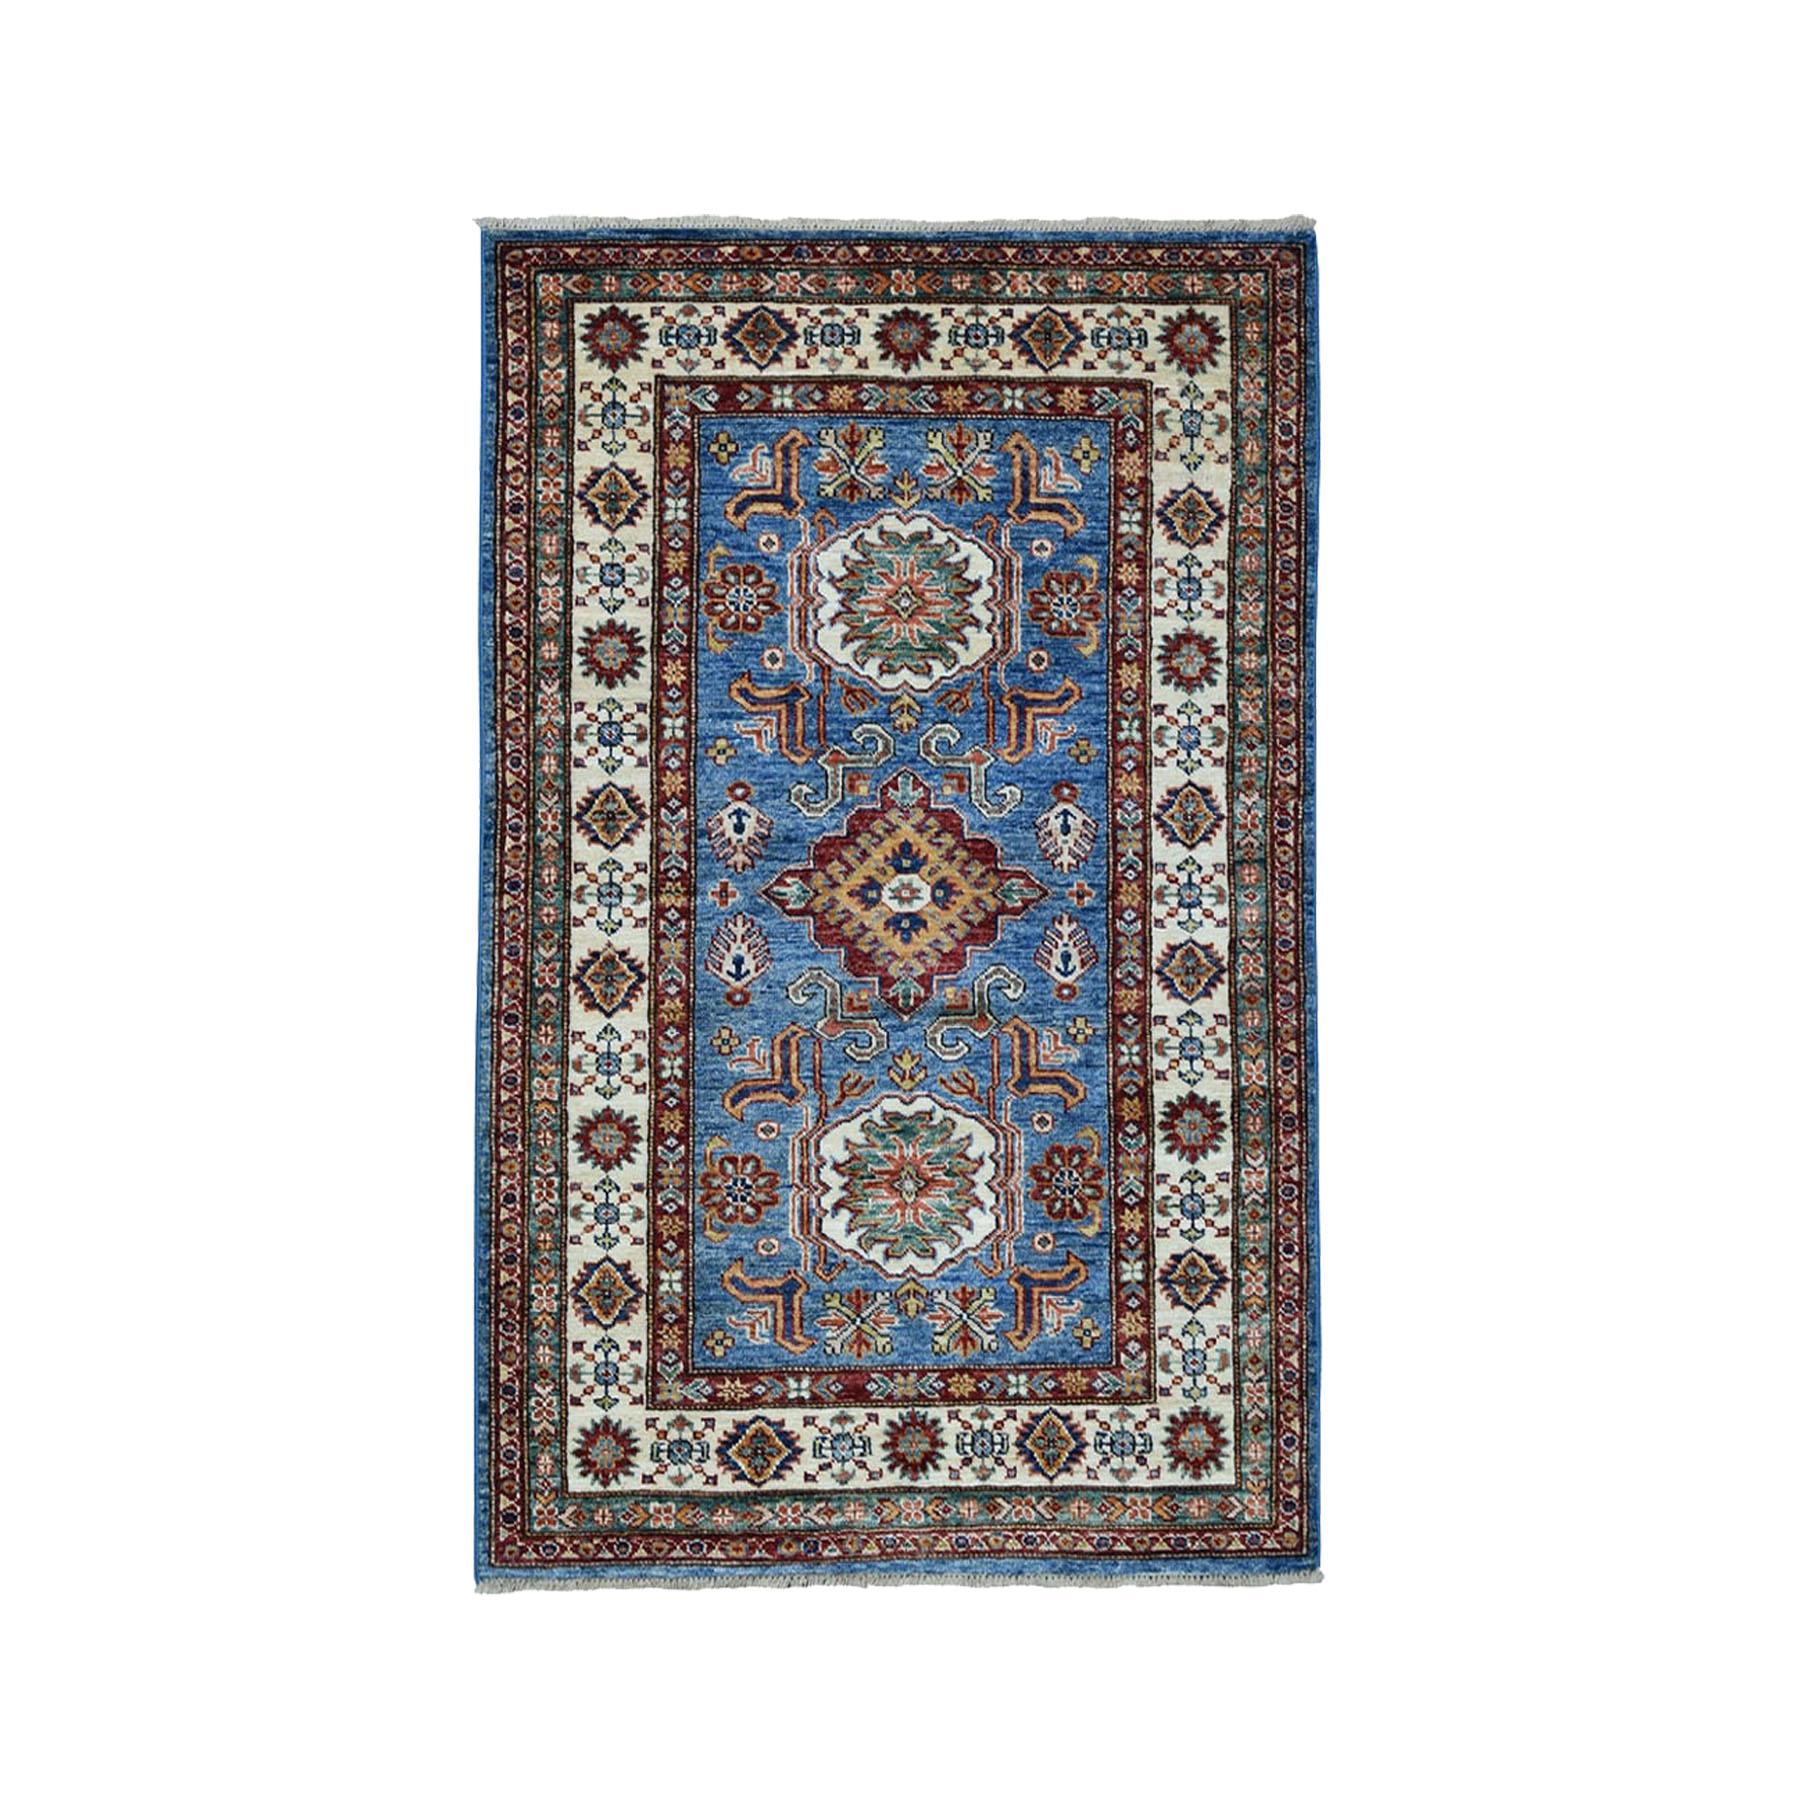 "3'3""X5' Blue Super Kazak Pure Wool Geometric Design Hand-Knotted Oriental Rug moae0096"